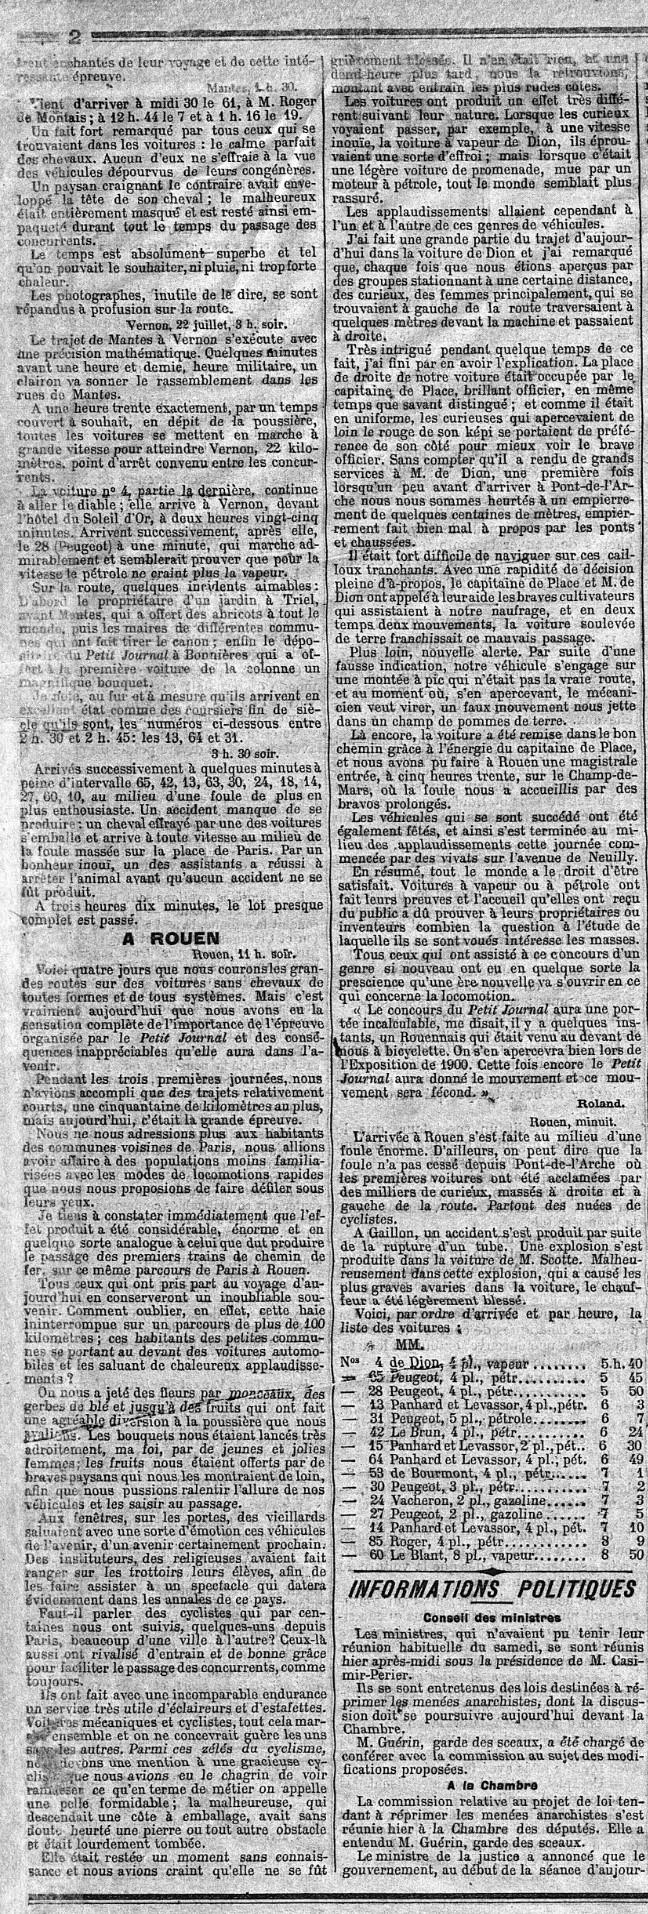 1894-07-23 3